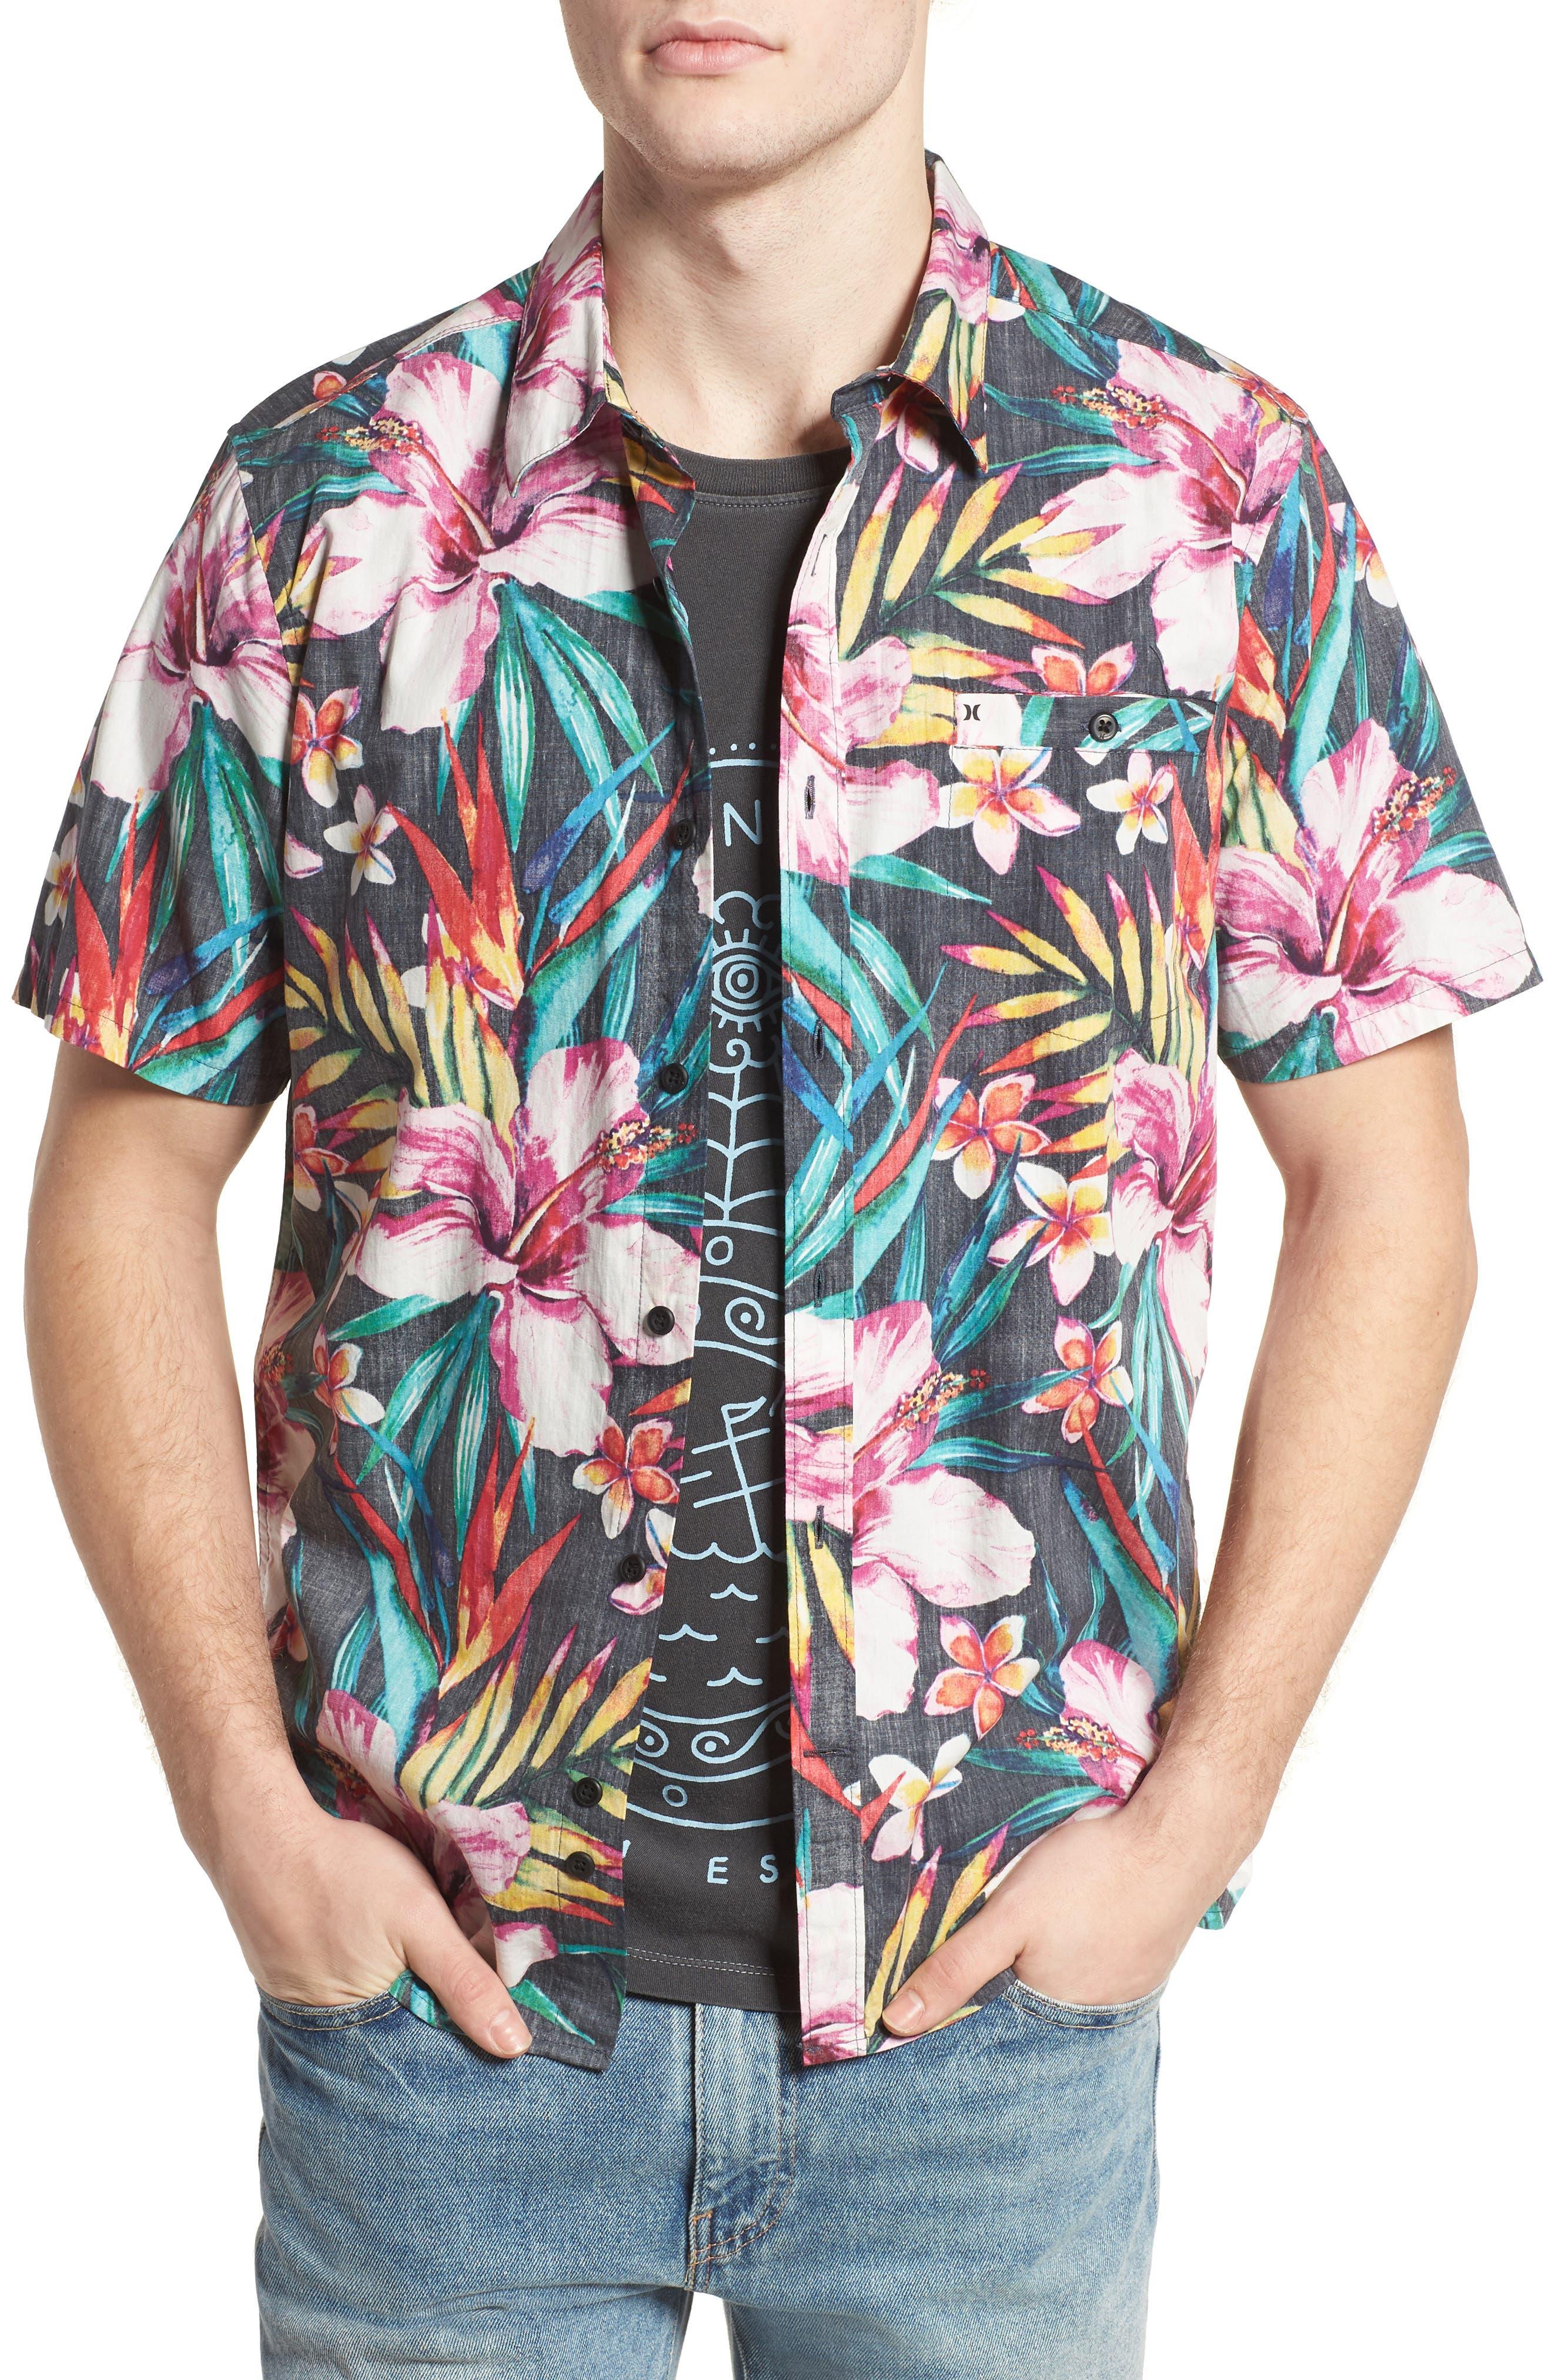 Hurley Garden Woven Shirt